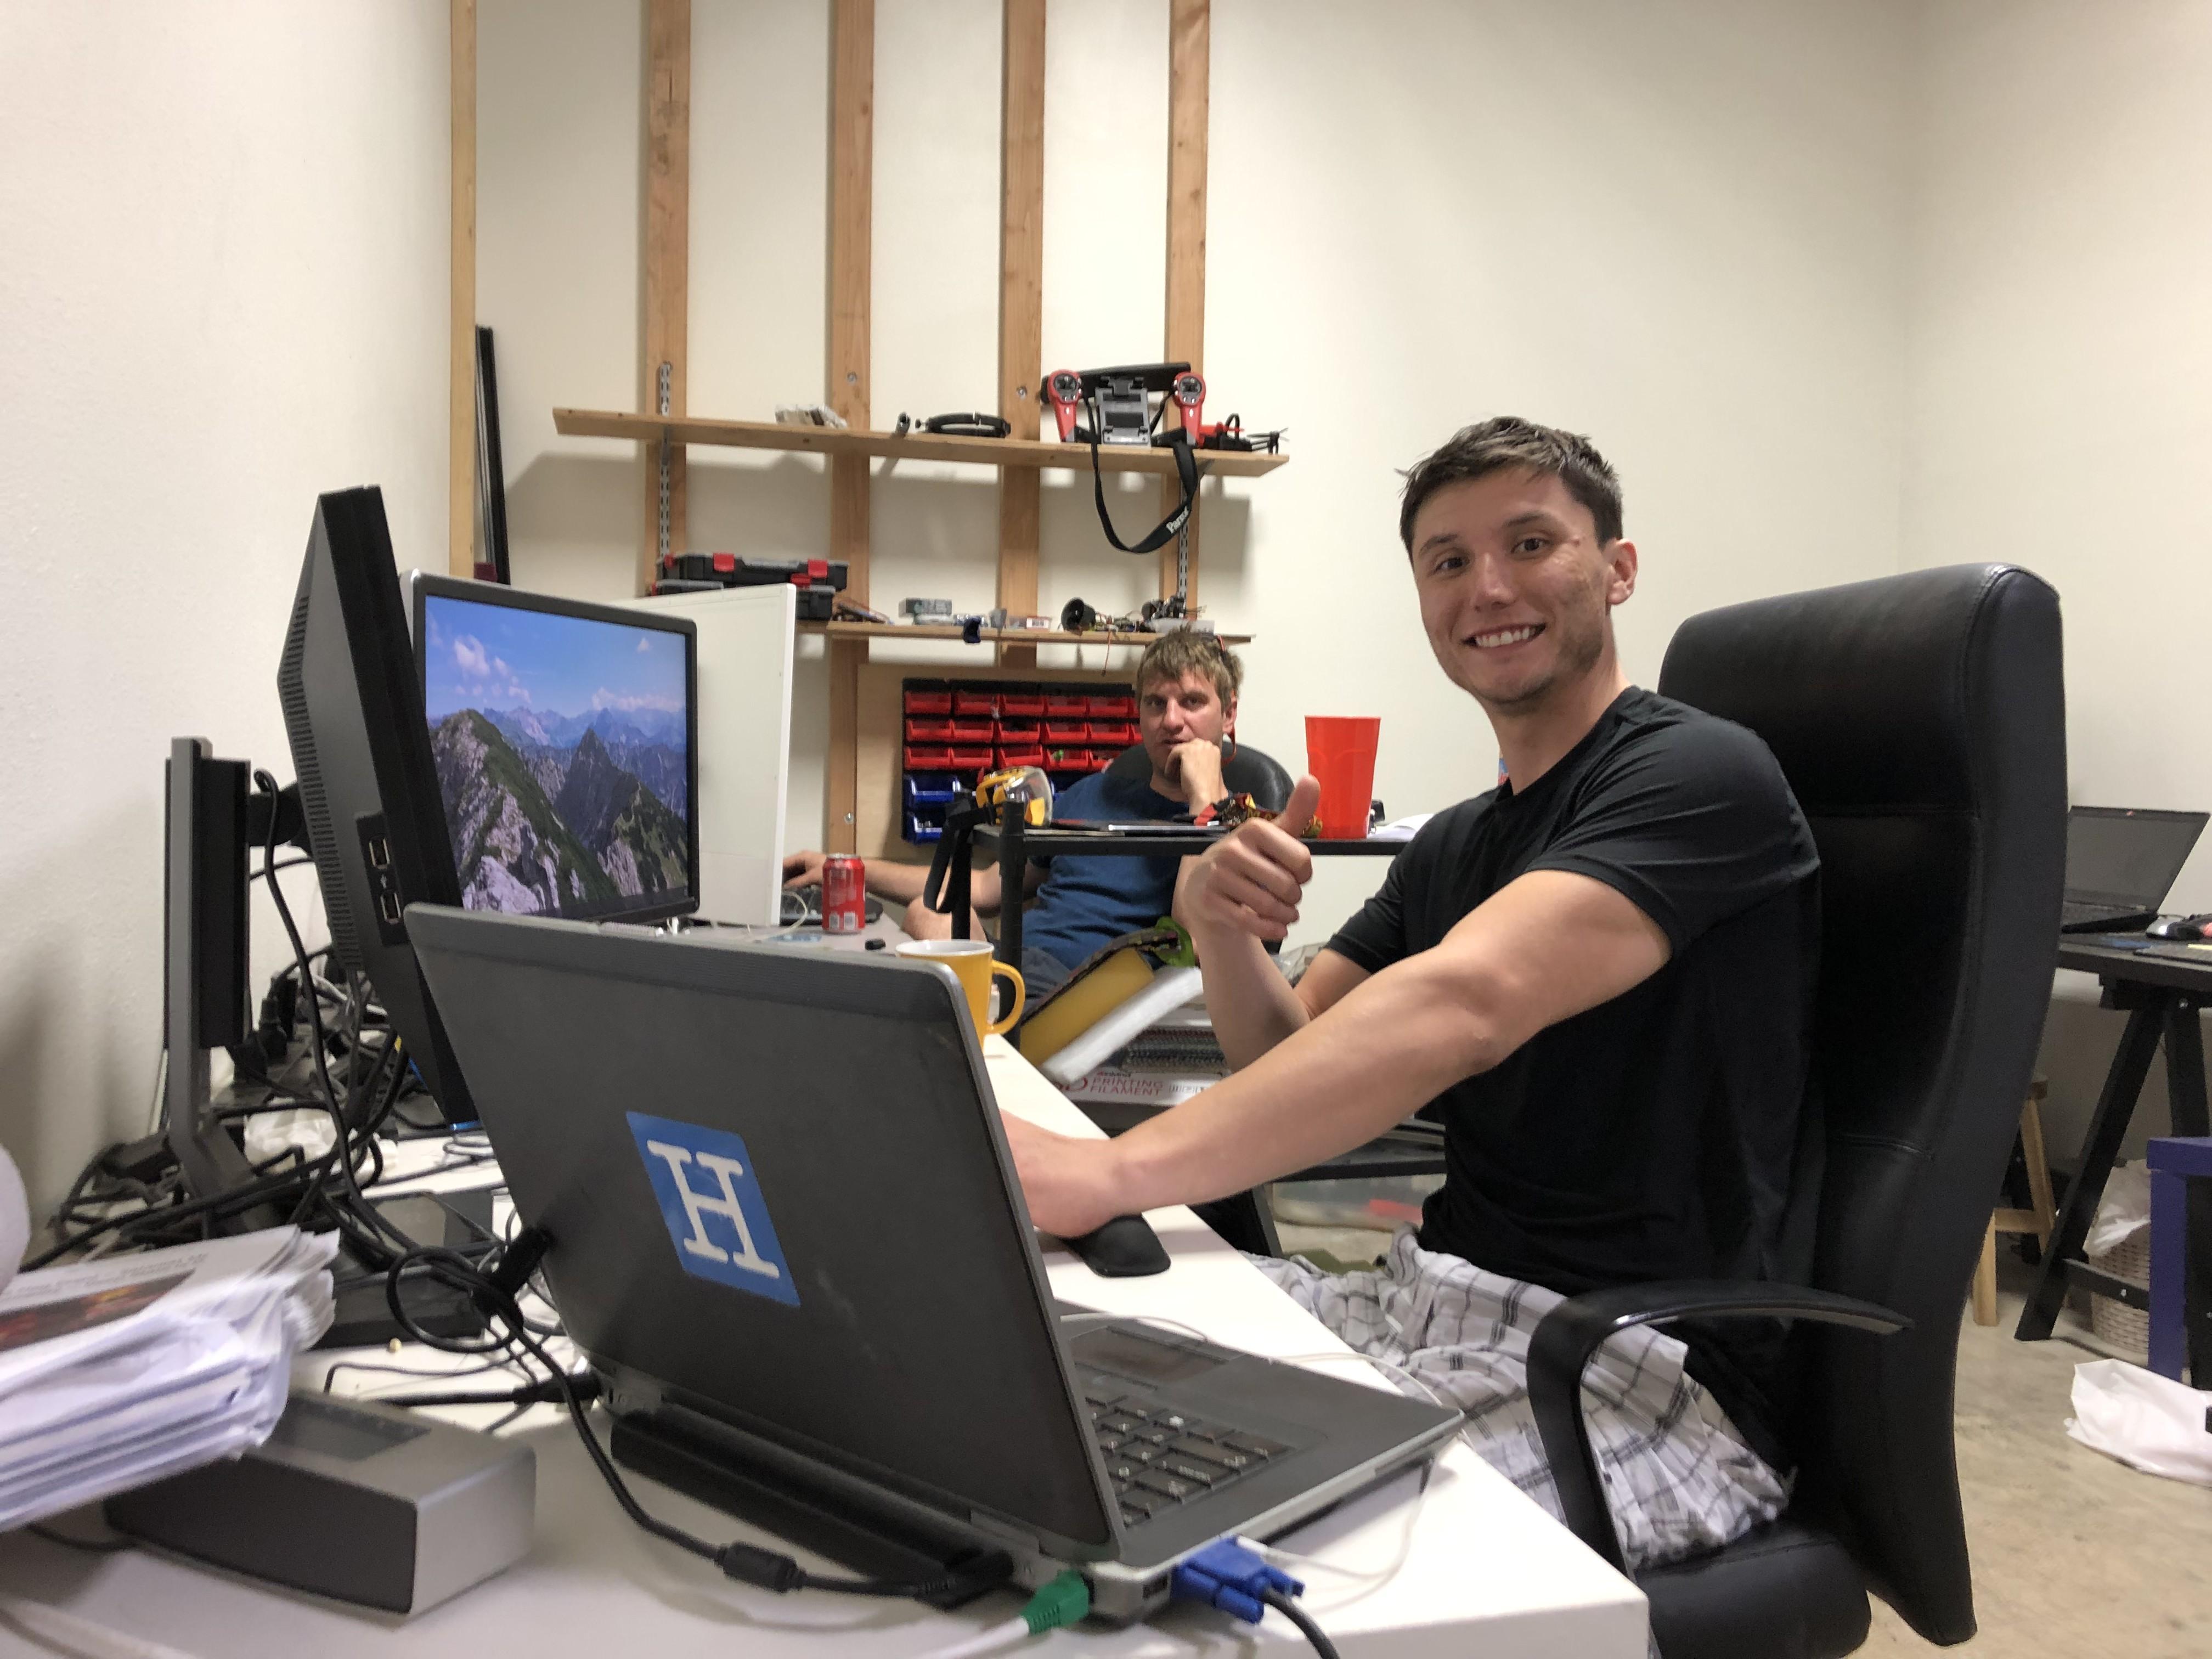 Josh at work